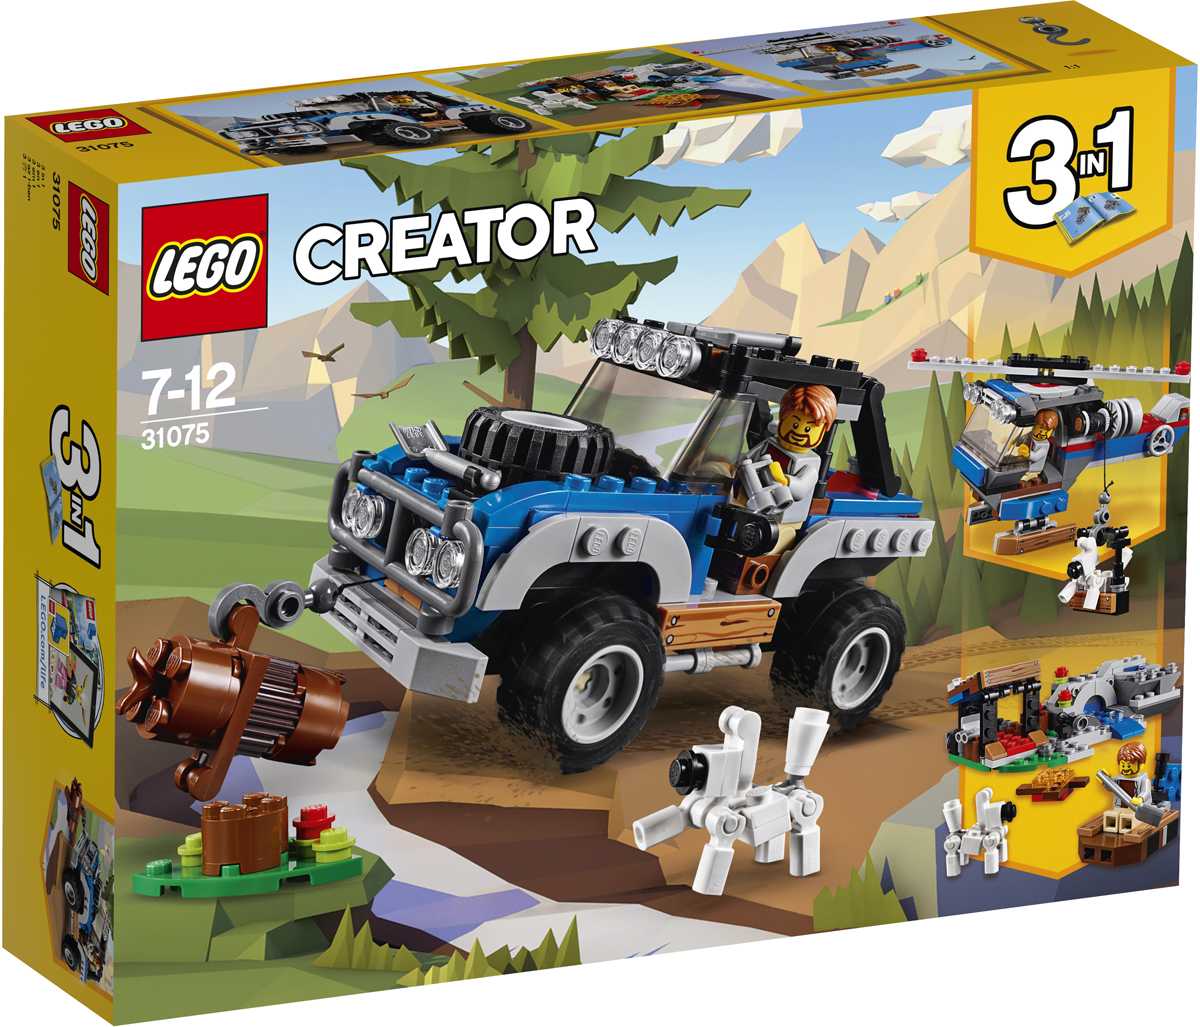 конструктор lego creator реактивный самолет 31042 LEGO Creator Конструктор Приключения в глуши 31075